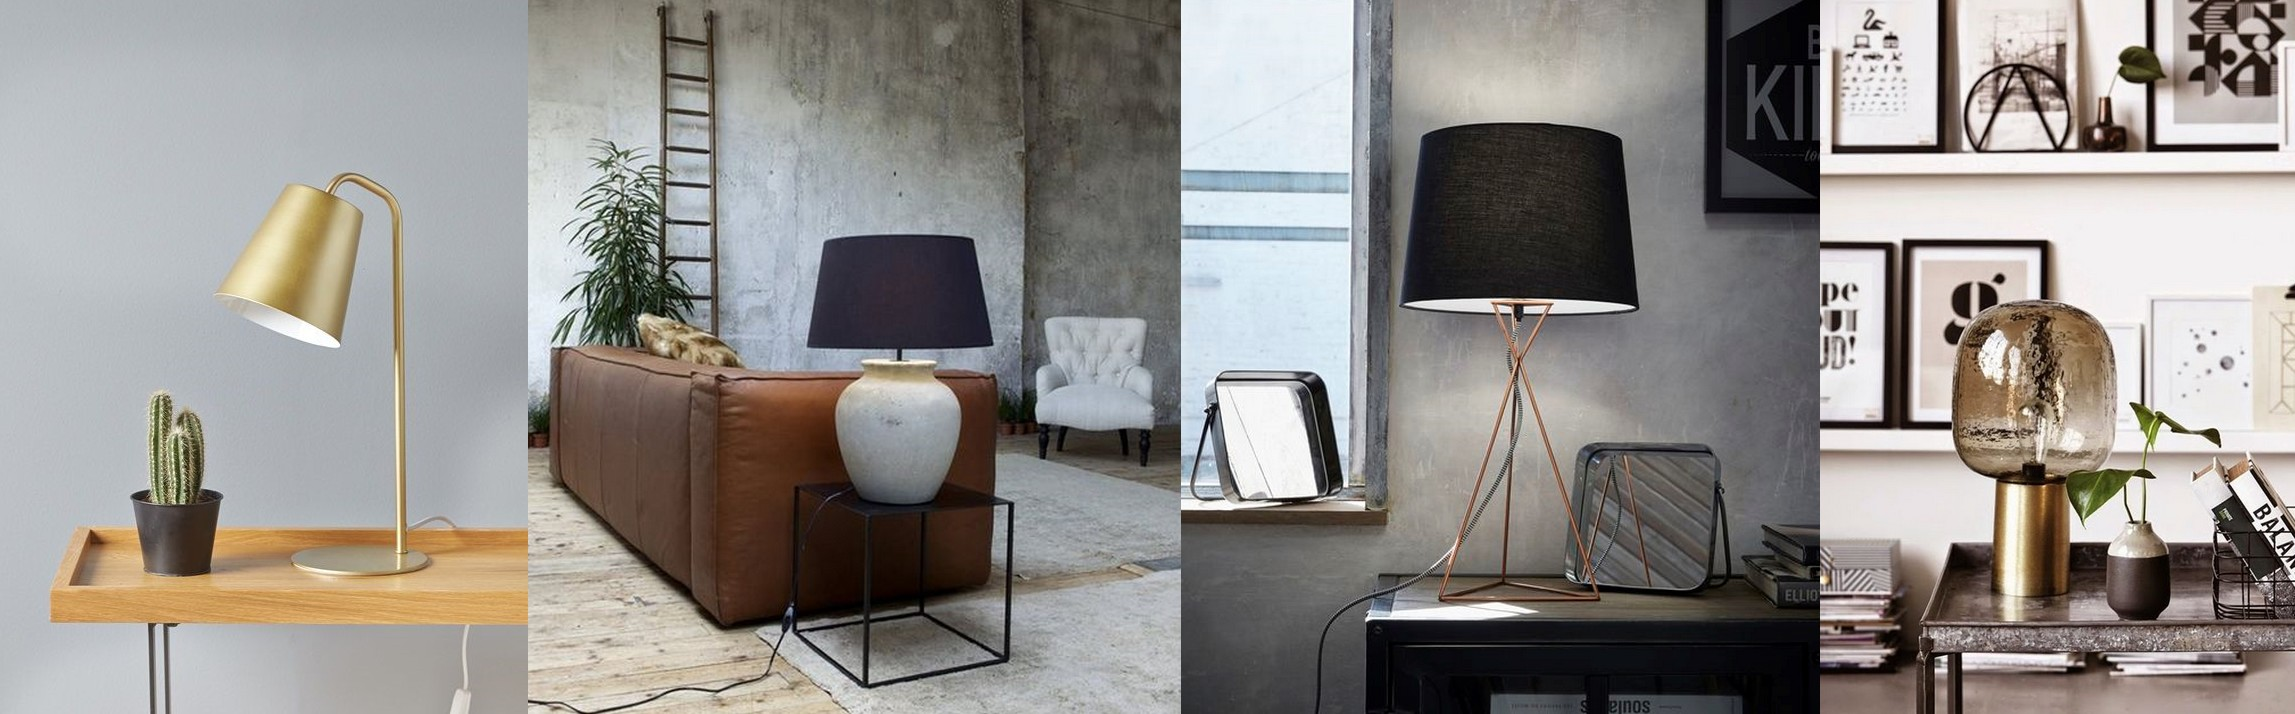 Eclairage lampe a poser (1).jpg